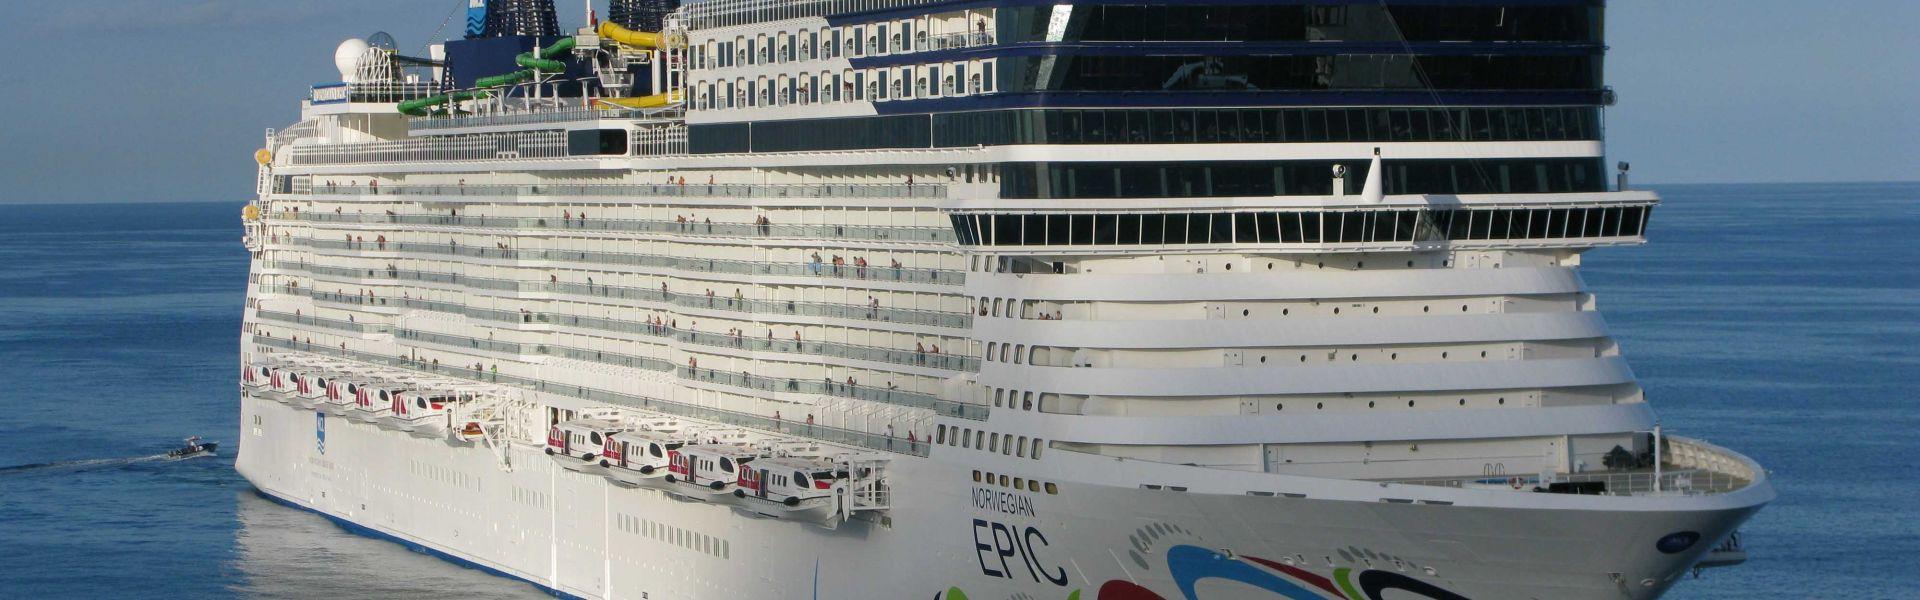 Croaziera 2017 - Mediterana de Vest (Civitavecchia) - Norwegian Cruise Line- Norwegian Epic - 7 nopti